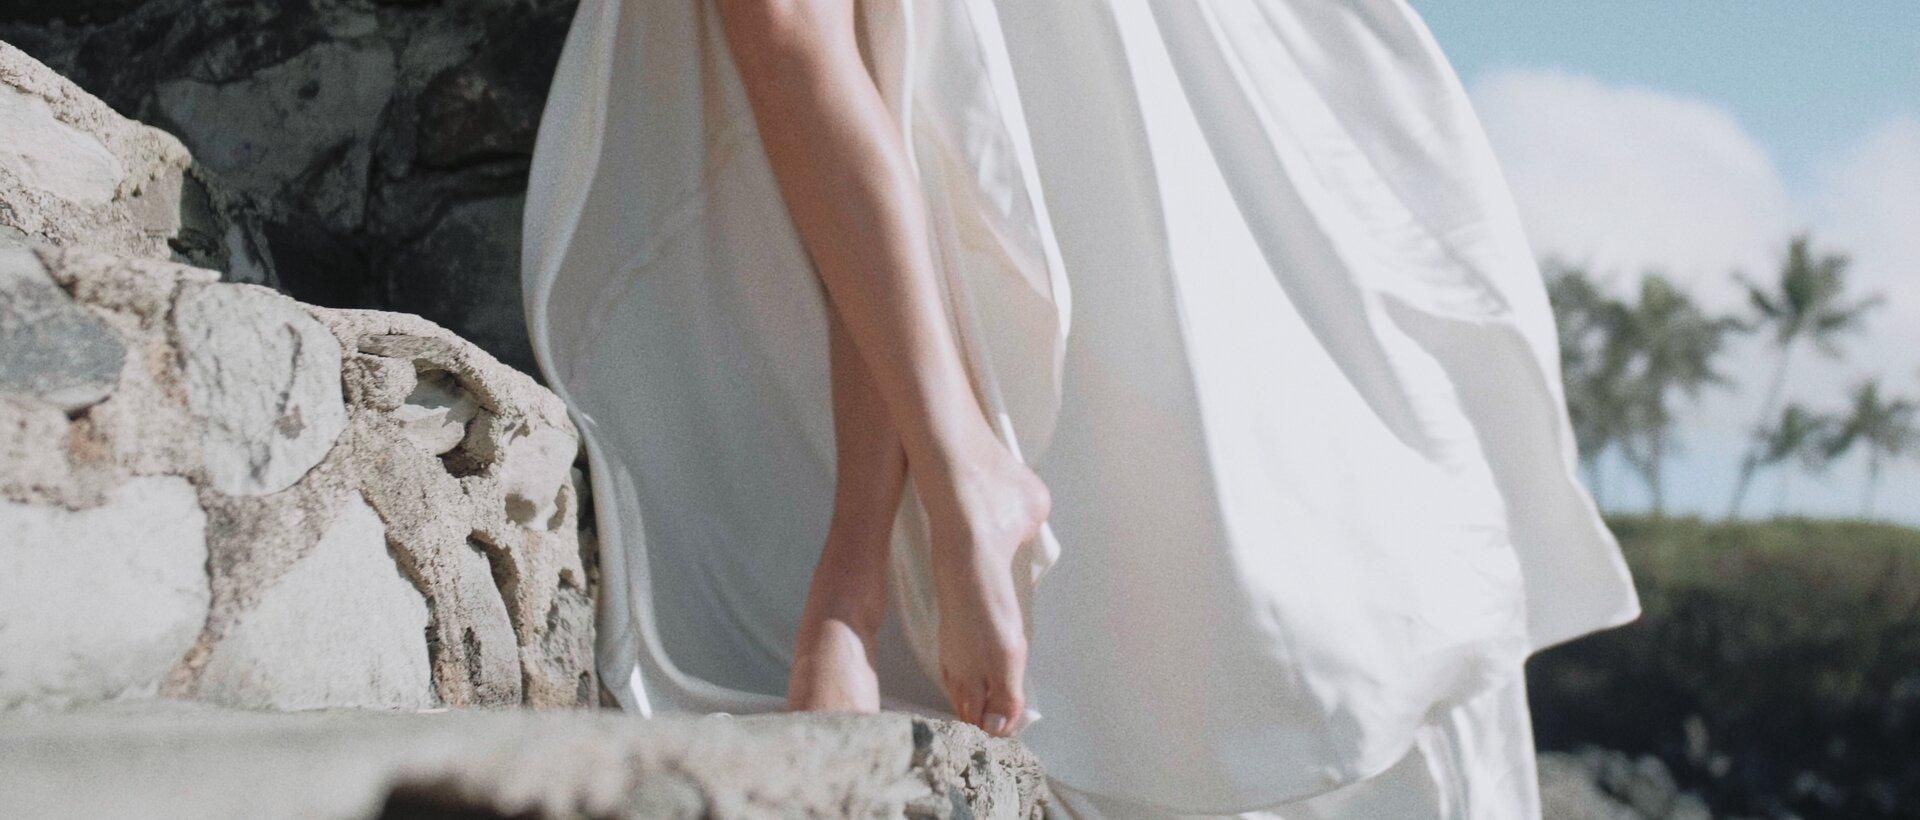 montage-kapalua-wedding-styled-shoot-_3.1.9.jpg